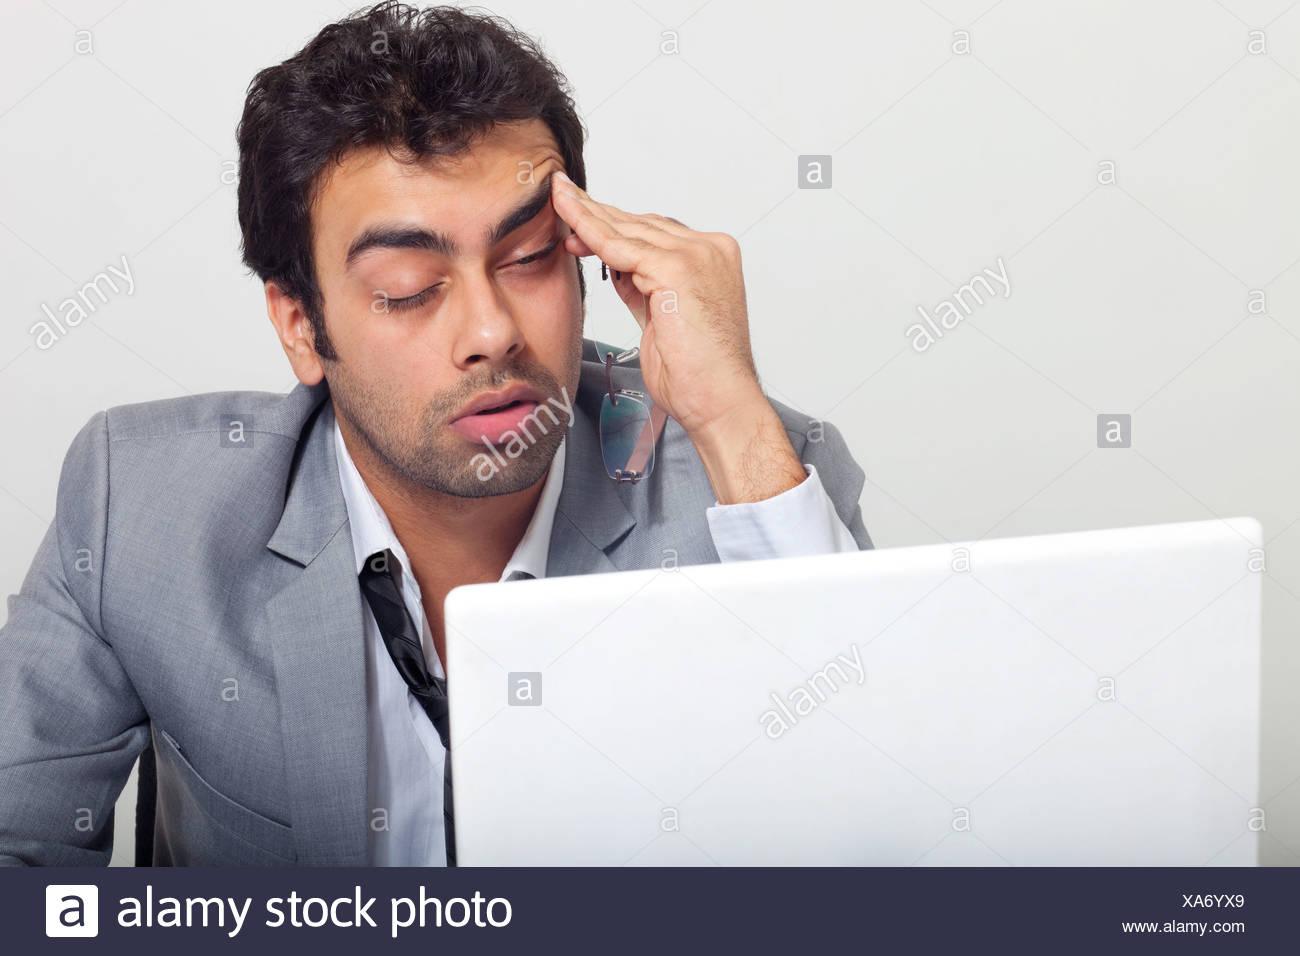 Businessman feeling sleepy at work - Stock Image